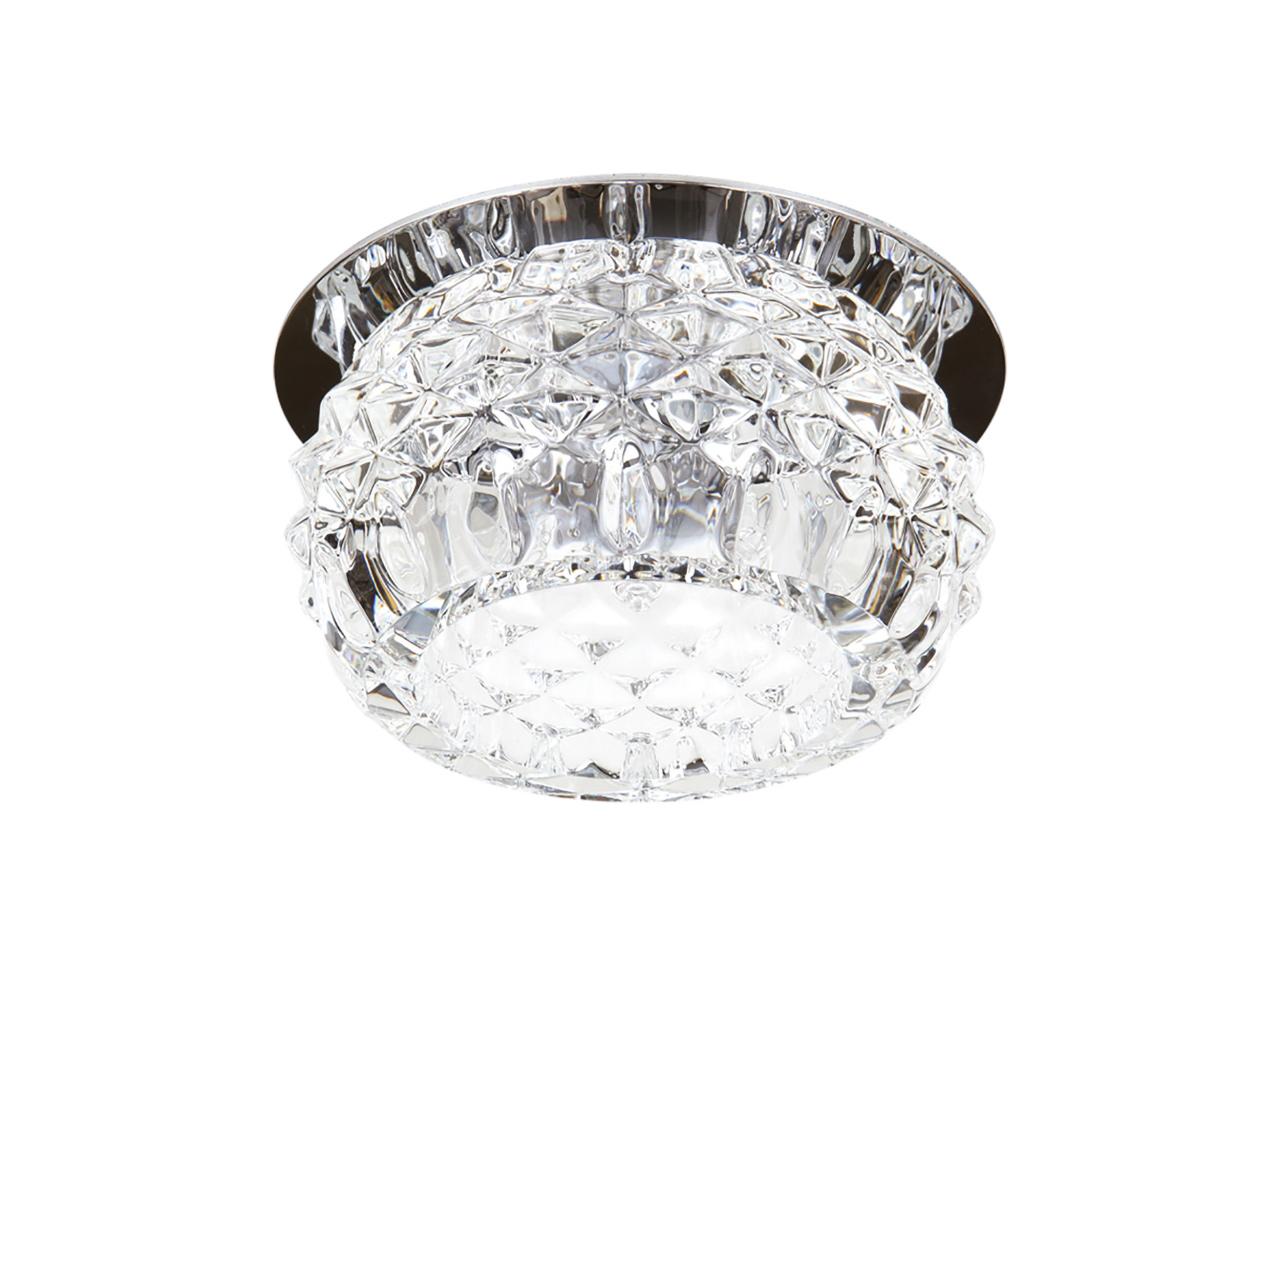 Светильник Cesare Sphe CR хром / прозрачный Lightstar 004254